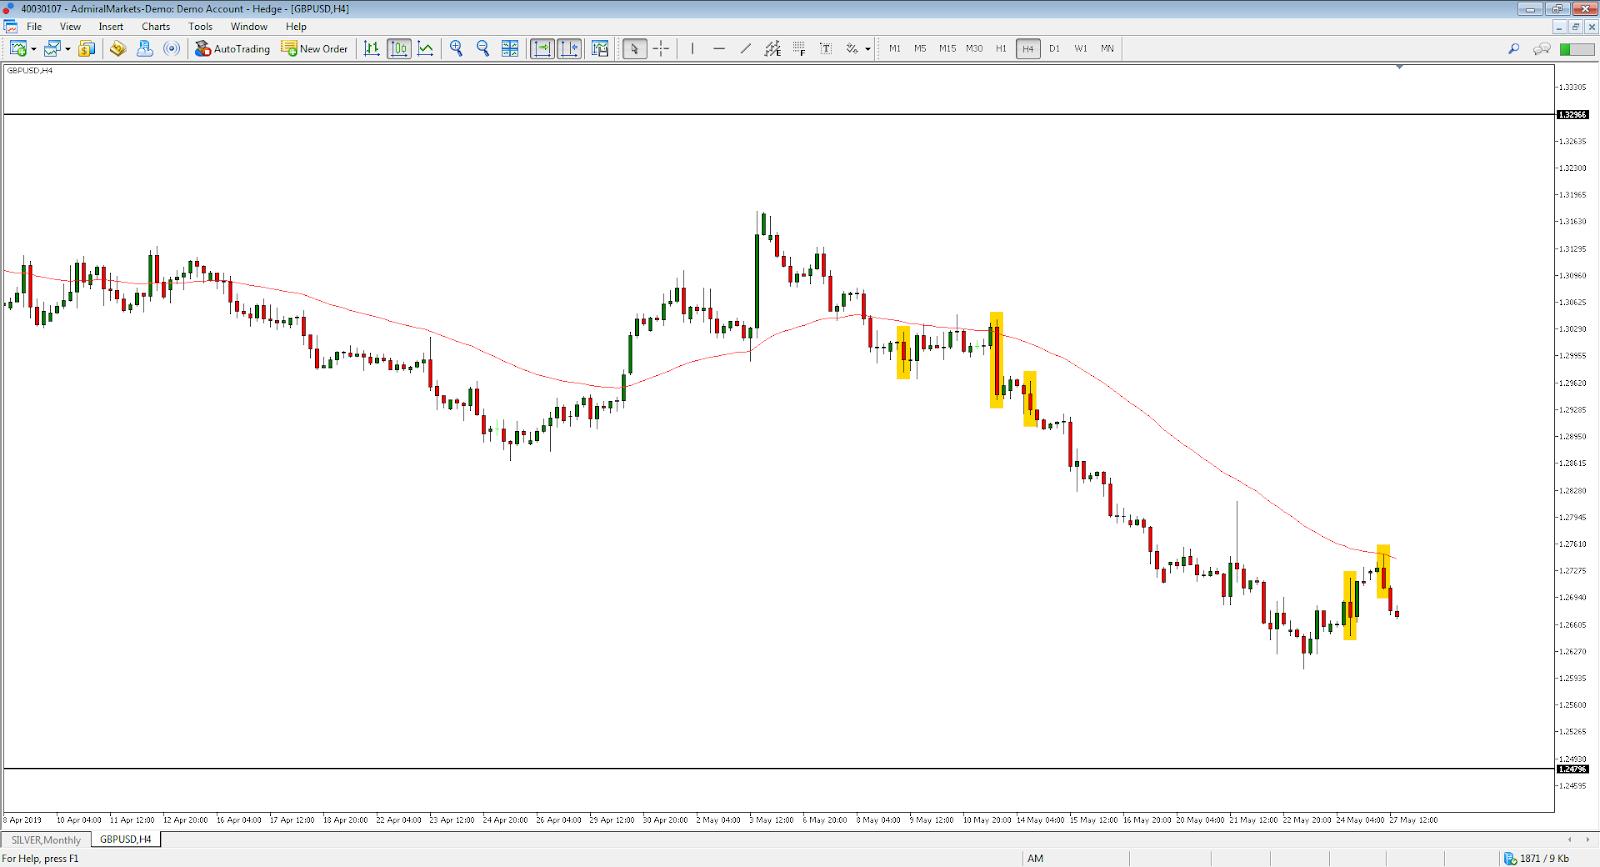 """Admiral Markets MT5 Supreme Edition"", GBP/USD, dieninis grafikas"